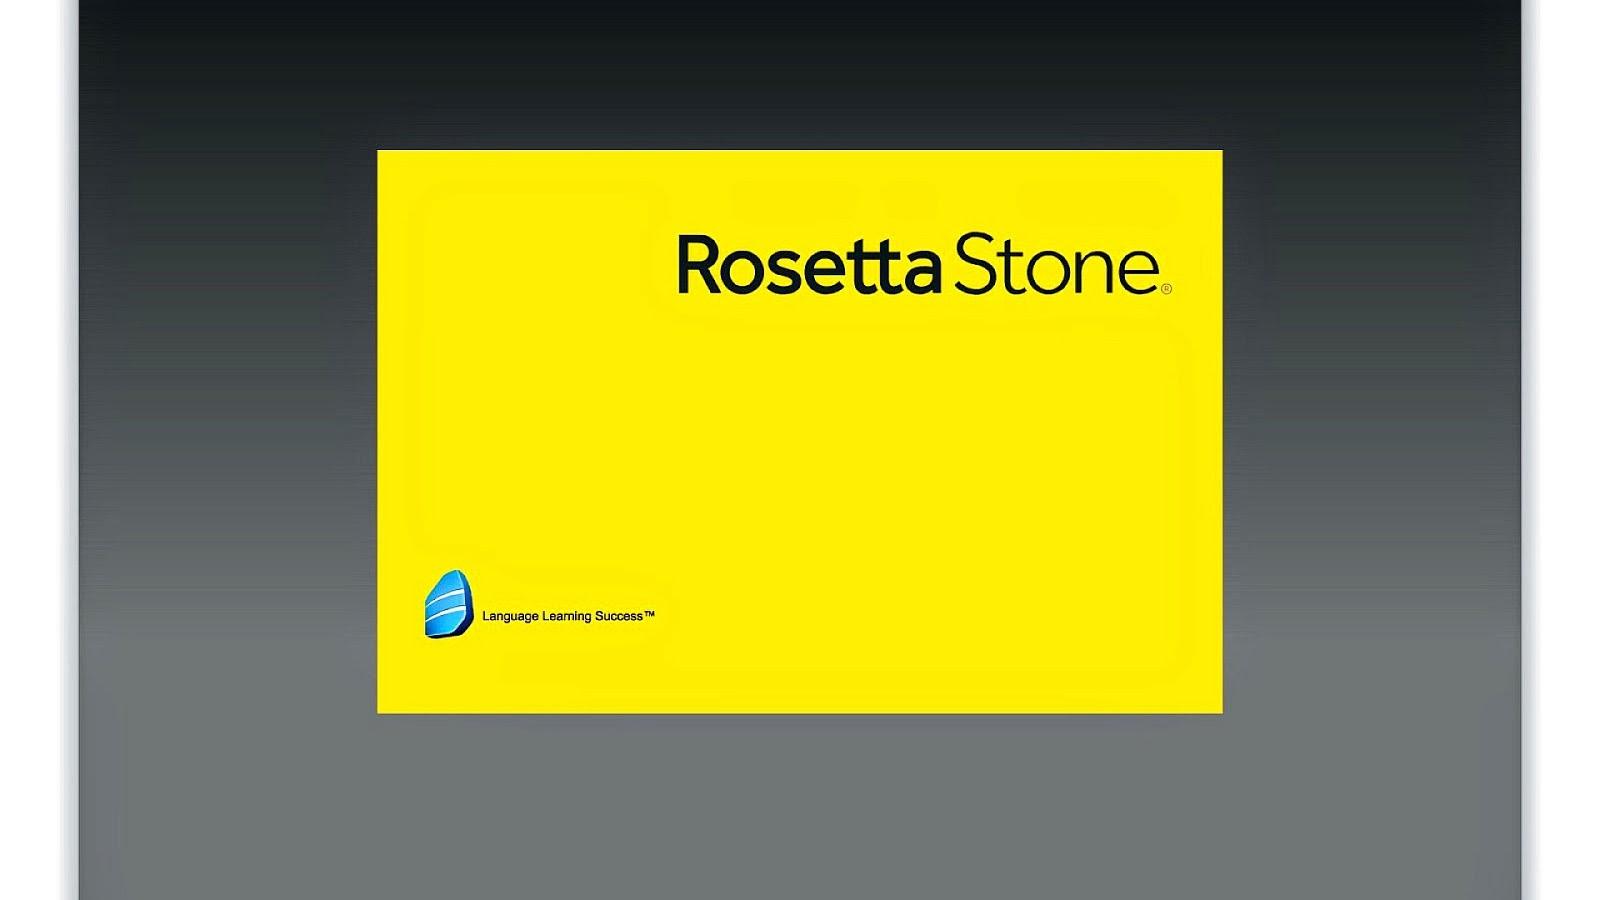 Hebrew rosetta stone torrent.